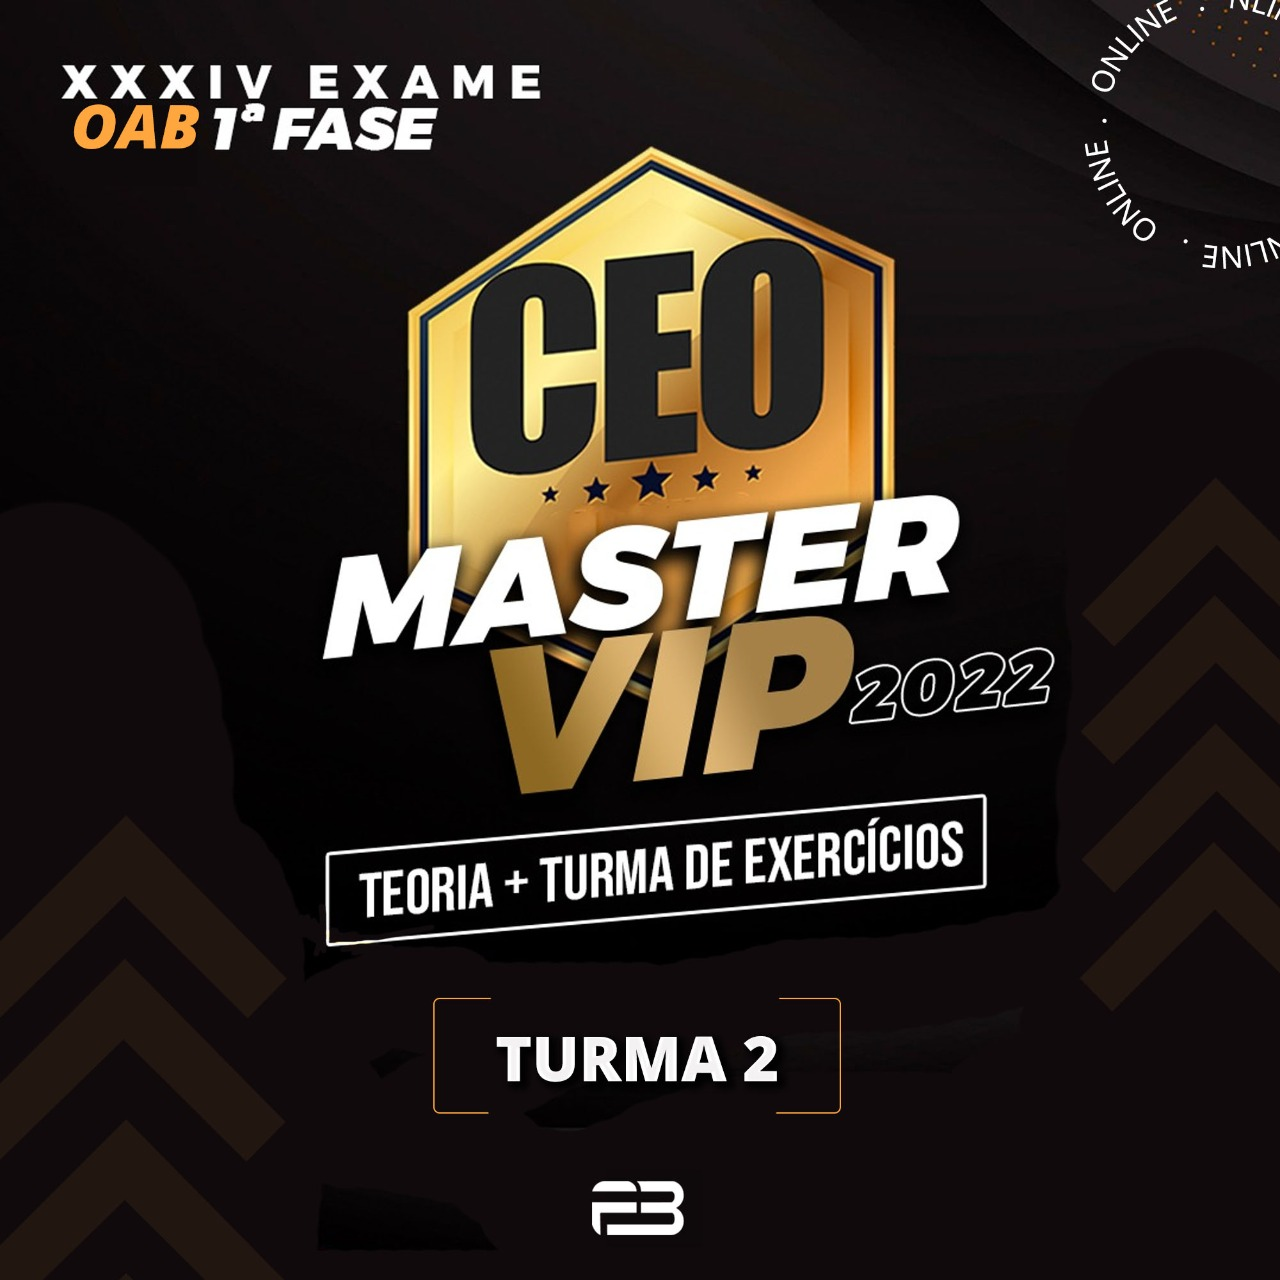 CEO MASTER VIP TURMA 2 - TEORIA + QUESTÕES - XXXIV EXAME OAB 1ª FASE